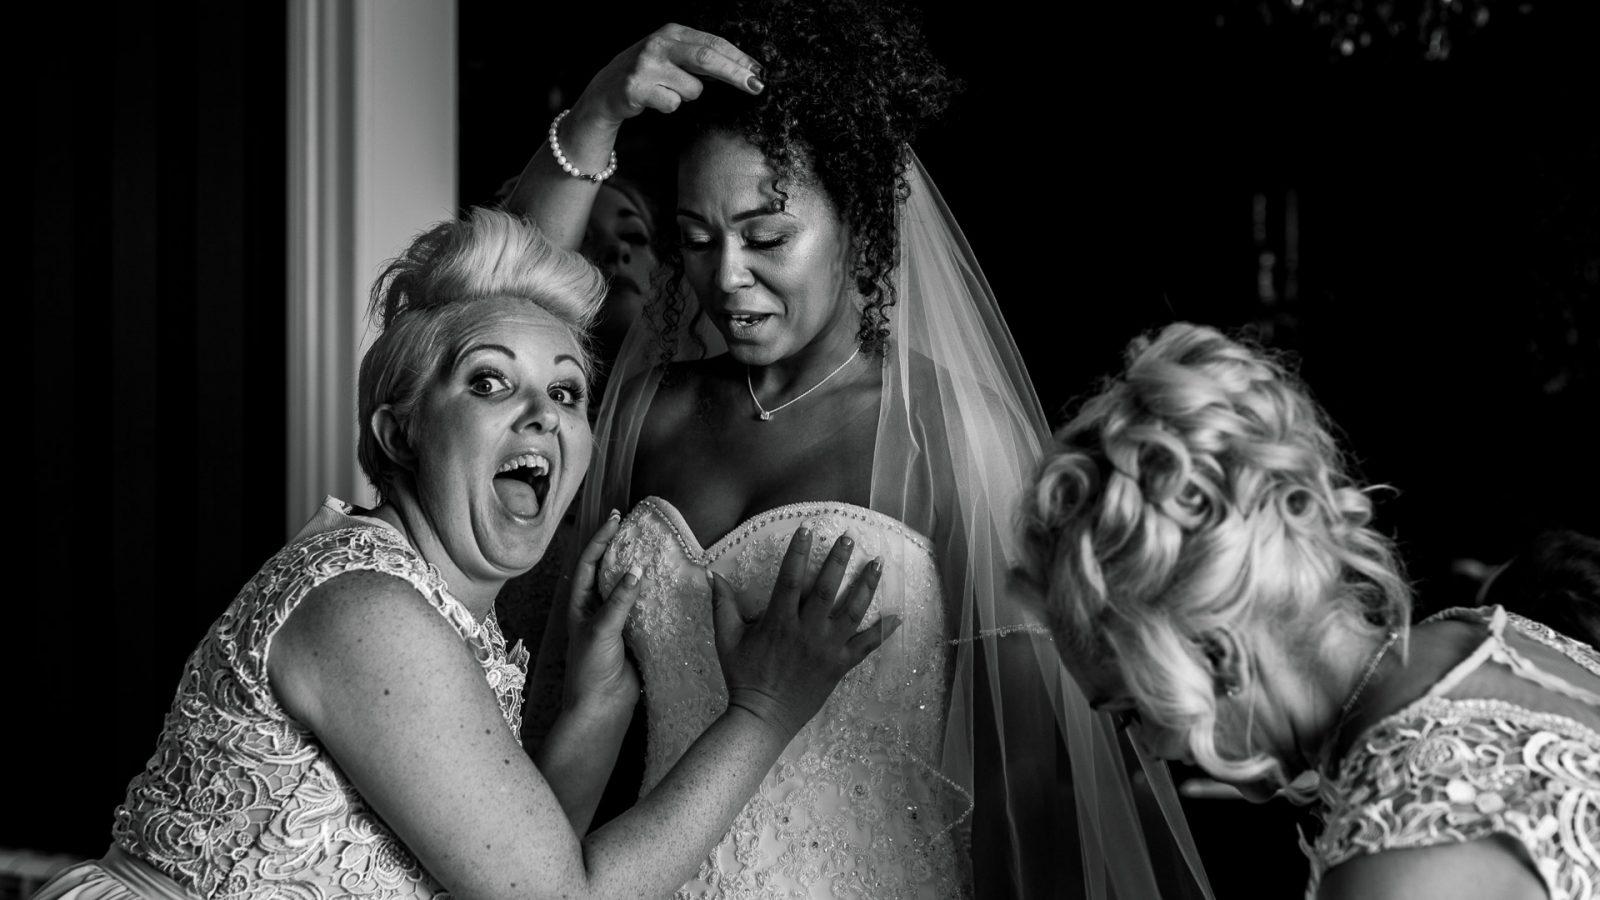 kimberley-and-joseph-wedding-bridesmaids-helping-bride-into-wedding-dress